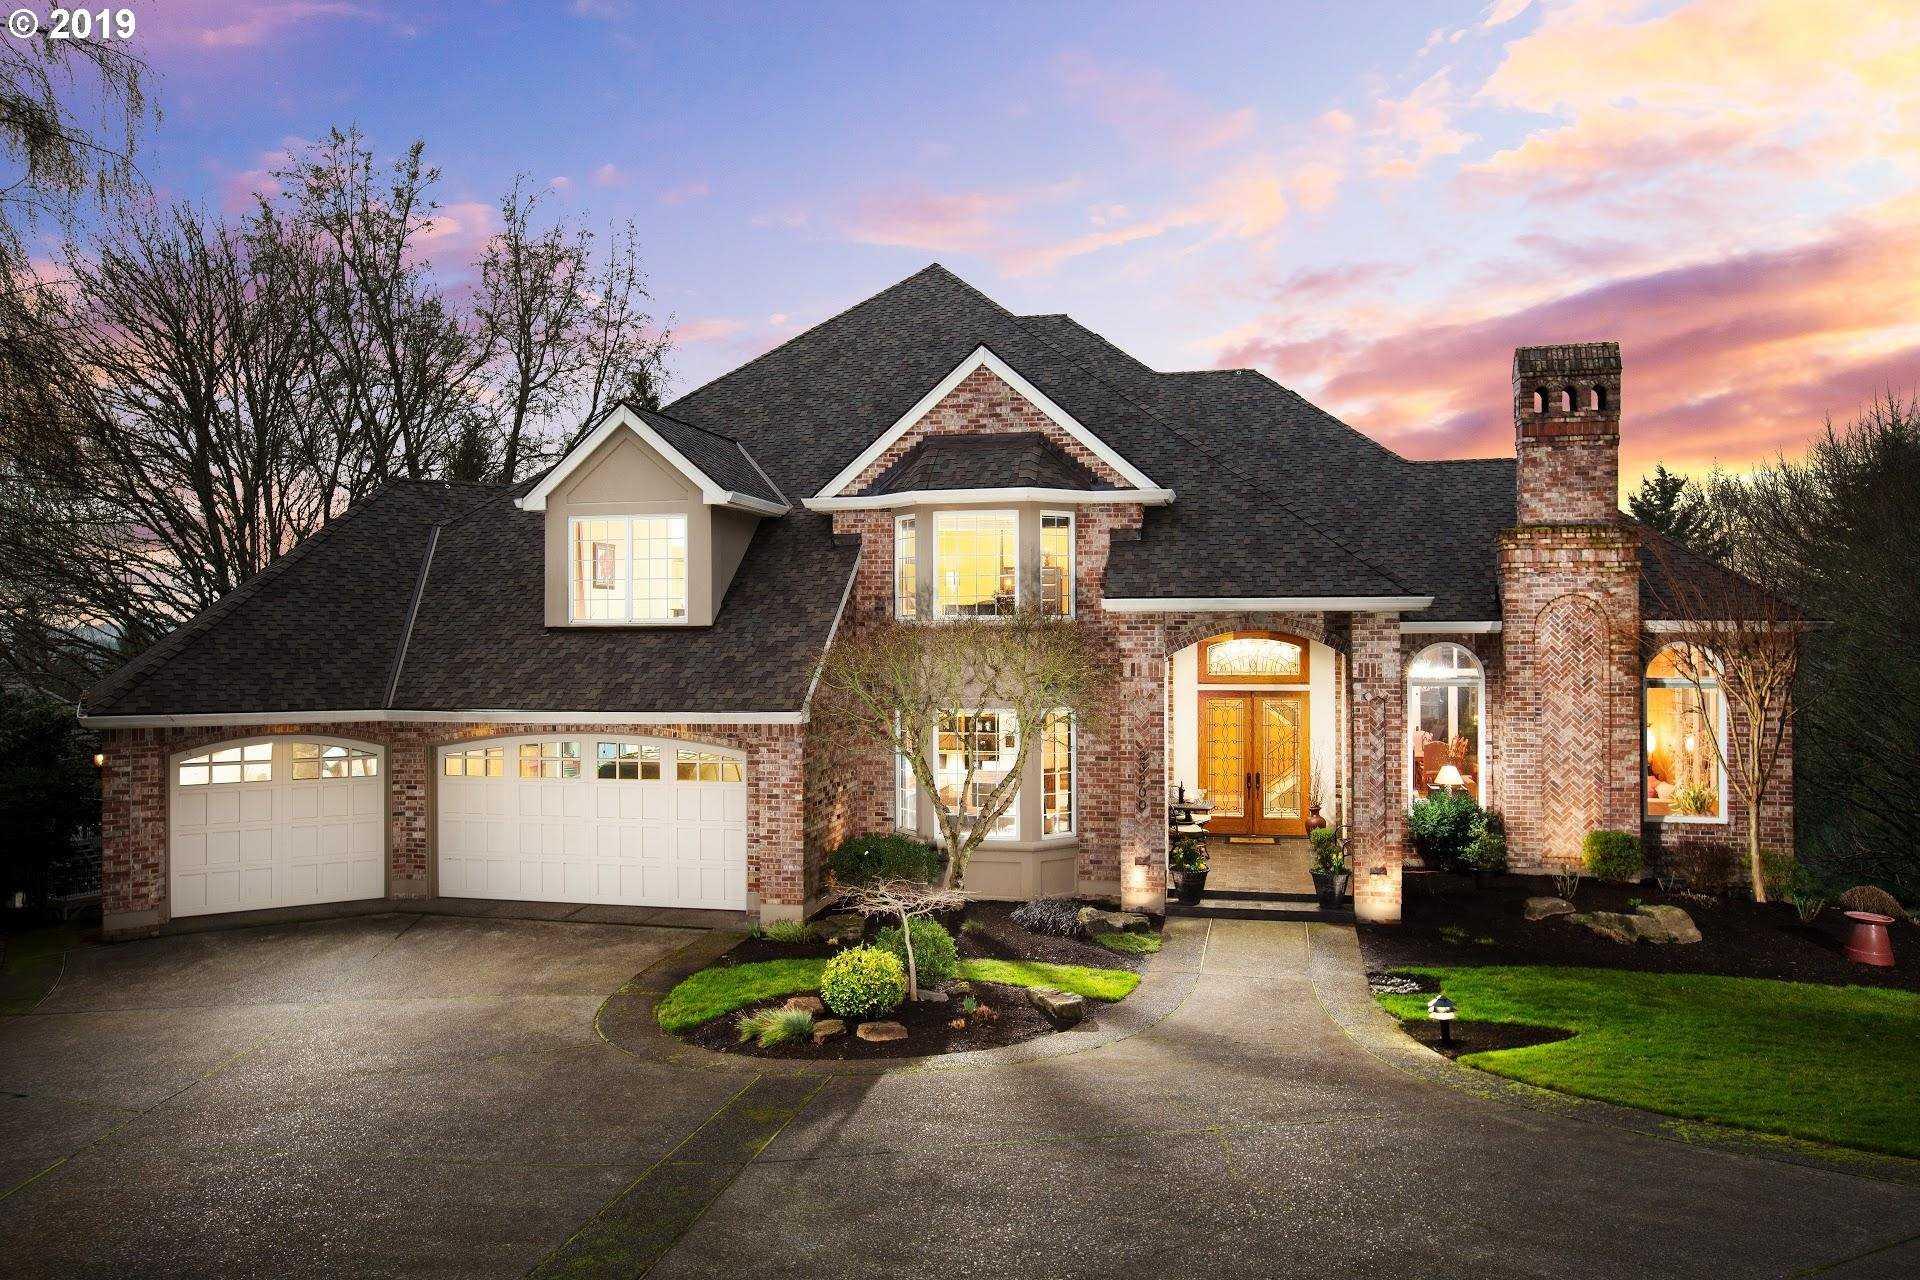 $1,799,000 - 5Br/5Ba -  for Sale in Stafford Hill Ranch, West Linn